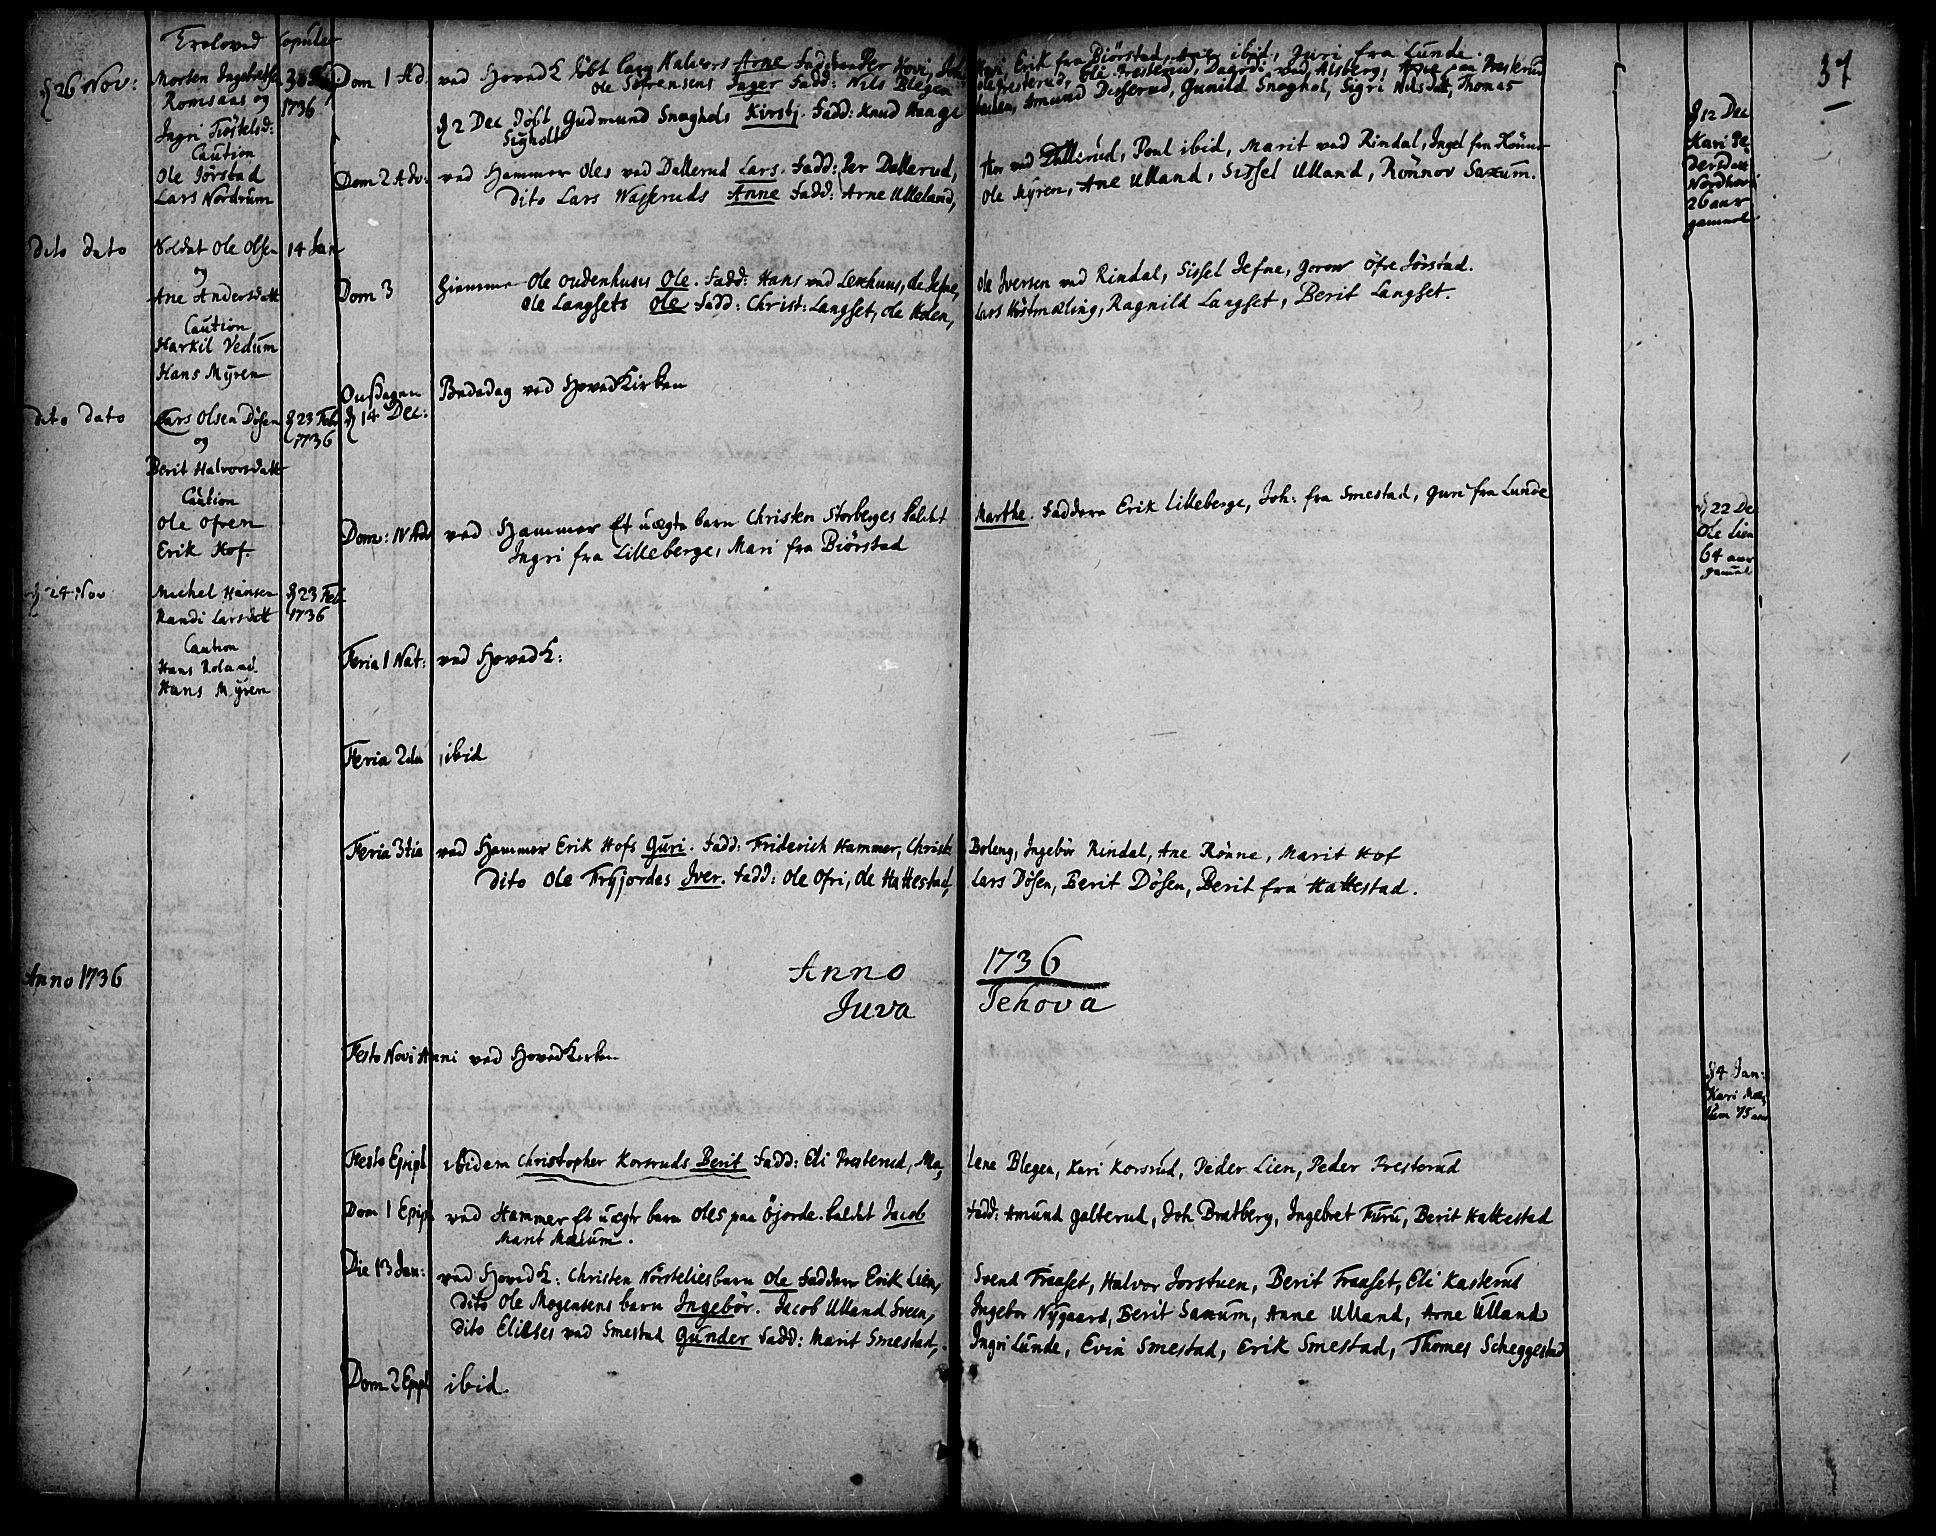 SAH, Fåberg prestekontor, Ministerialbok nr. 1, 1727-1775, s. 37